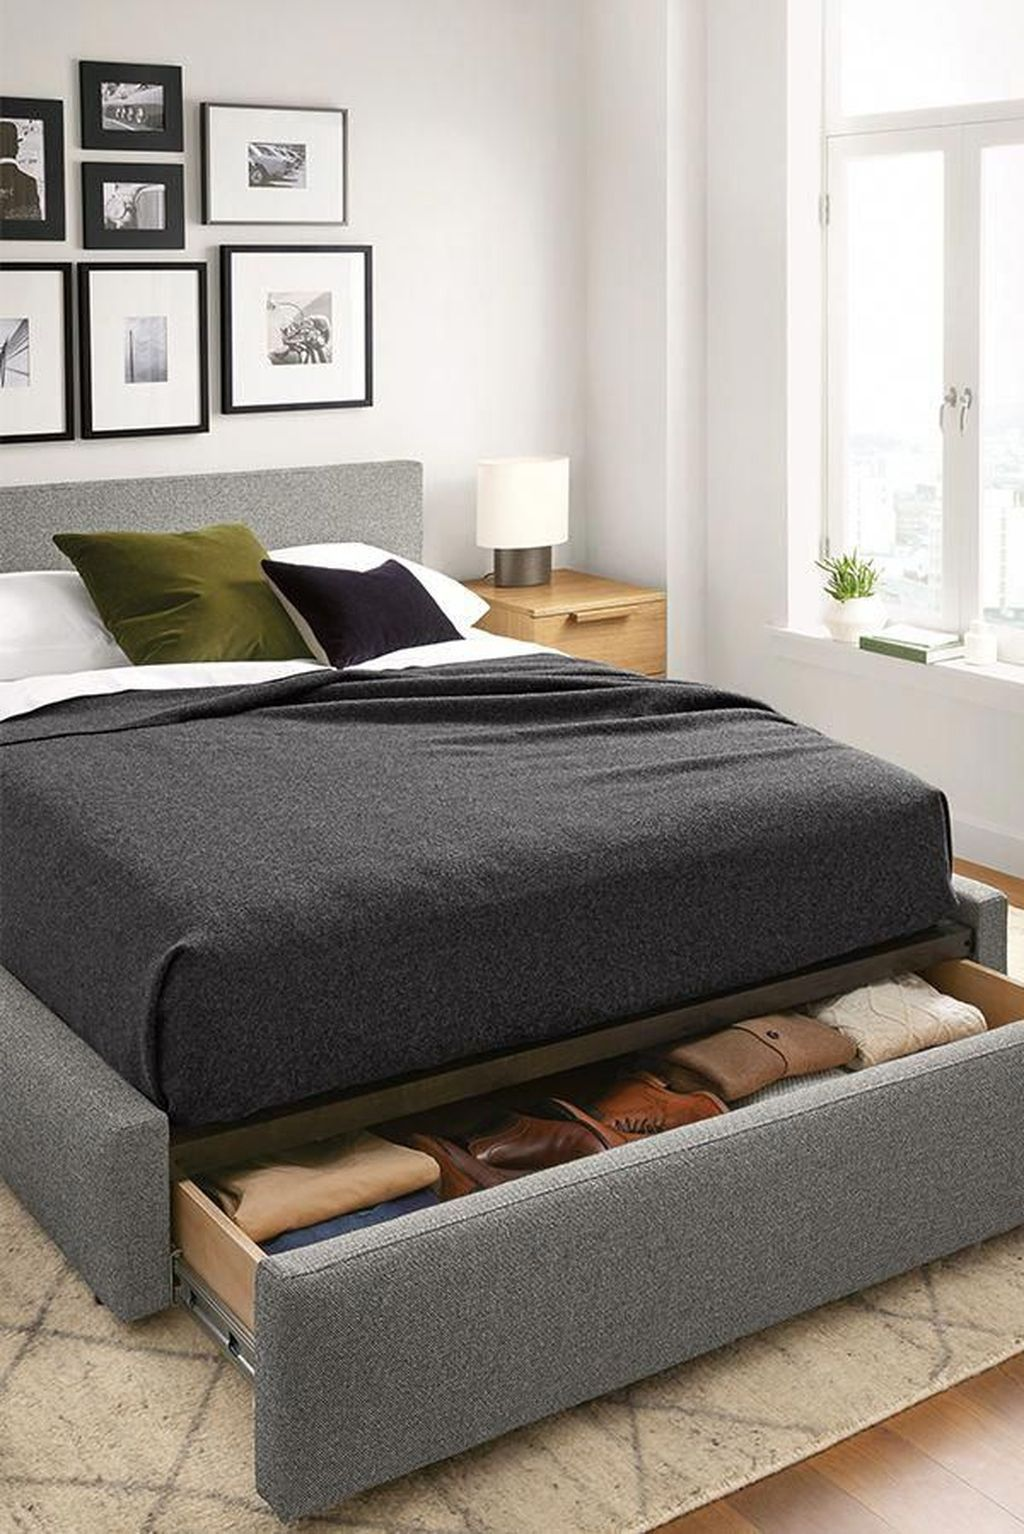 10 Wonderful Hidden Bedroom Storage Design Ideas For Small Space